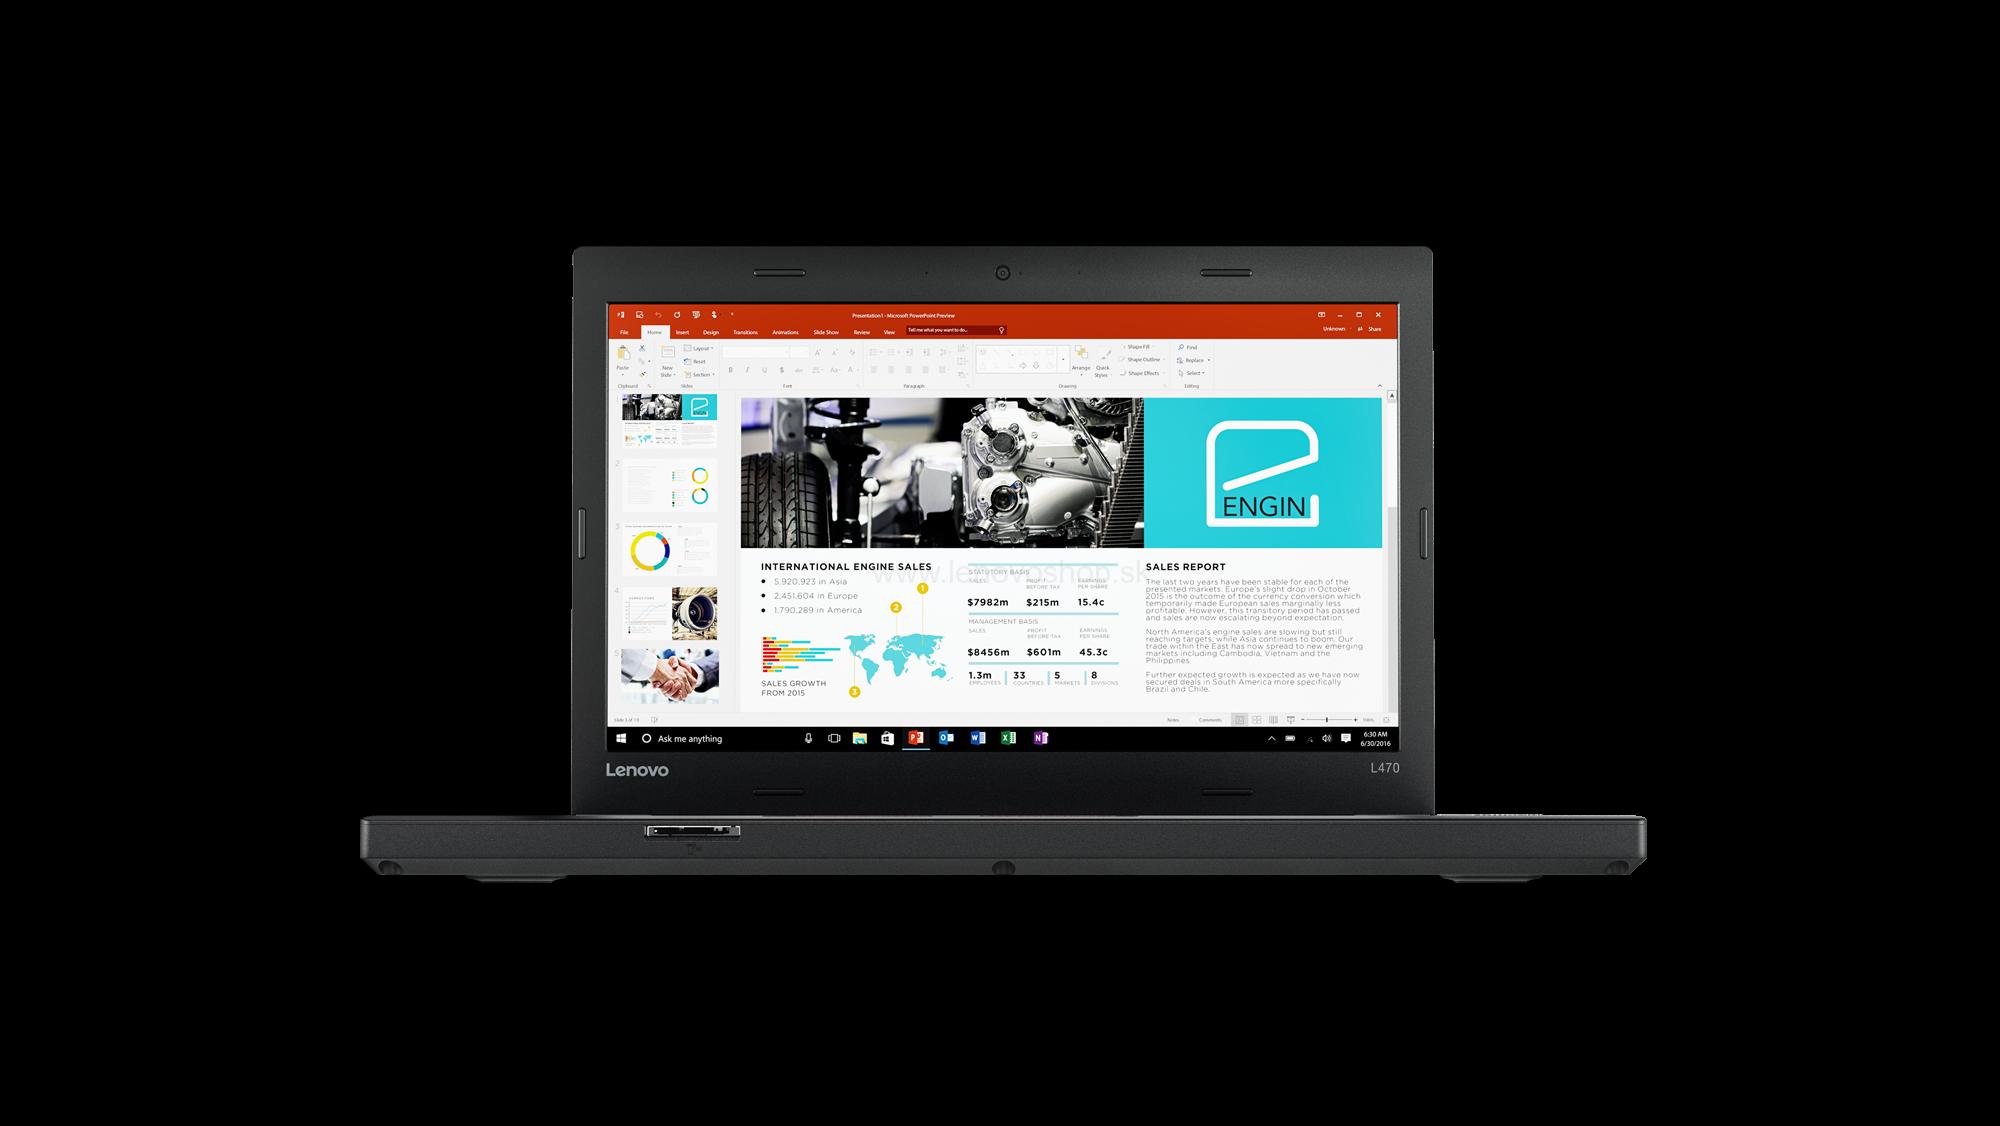 Lenovo ThinkPad L470 20J4000NXS